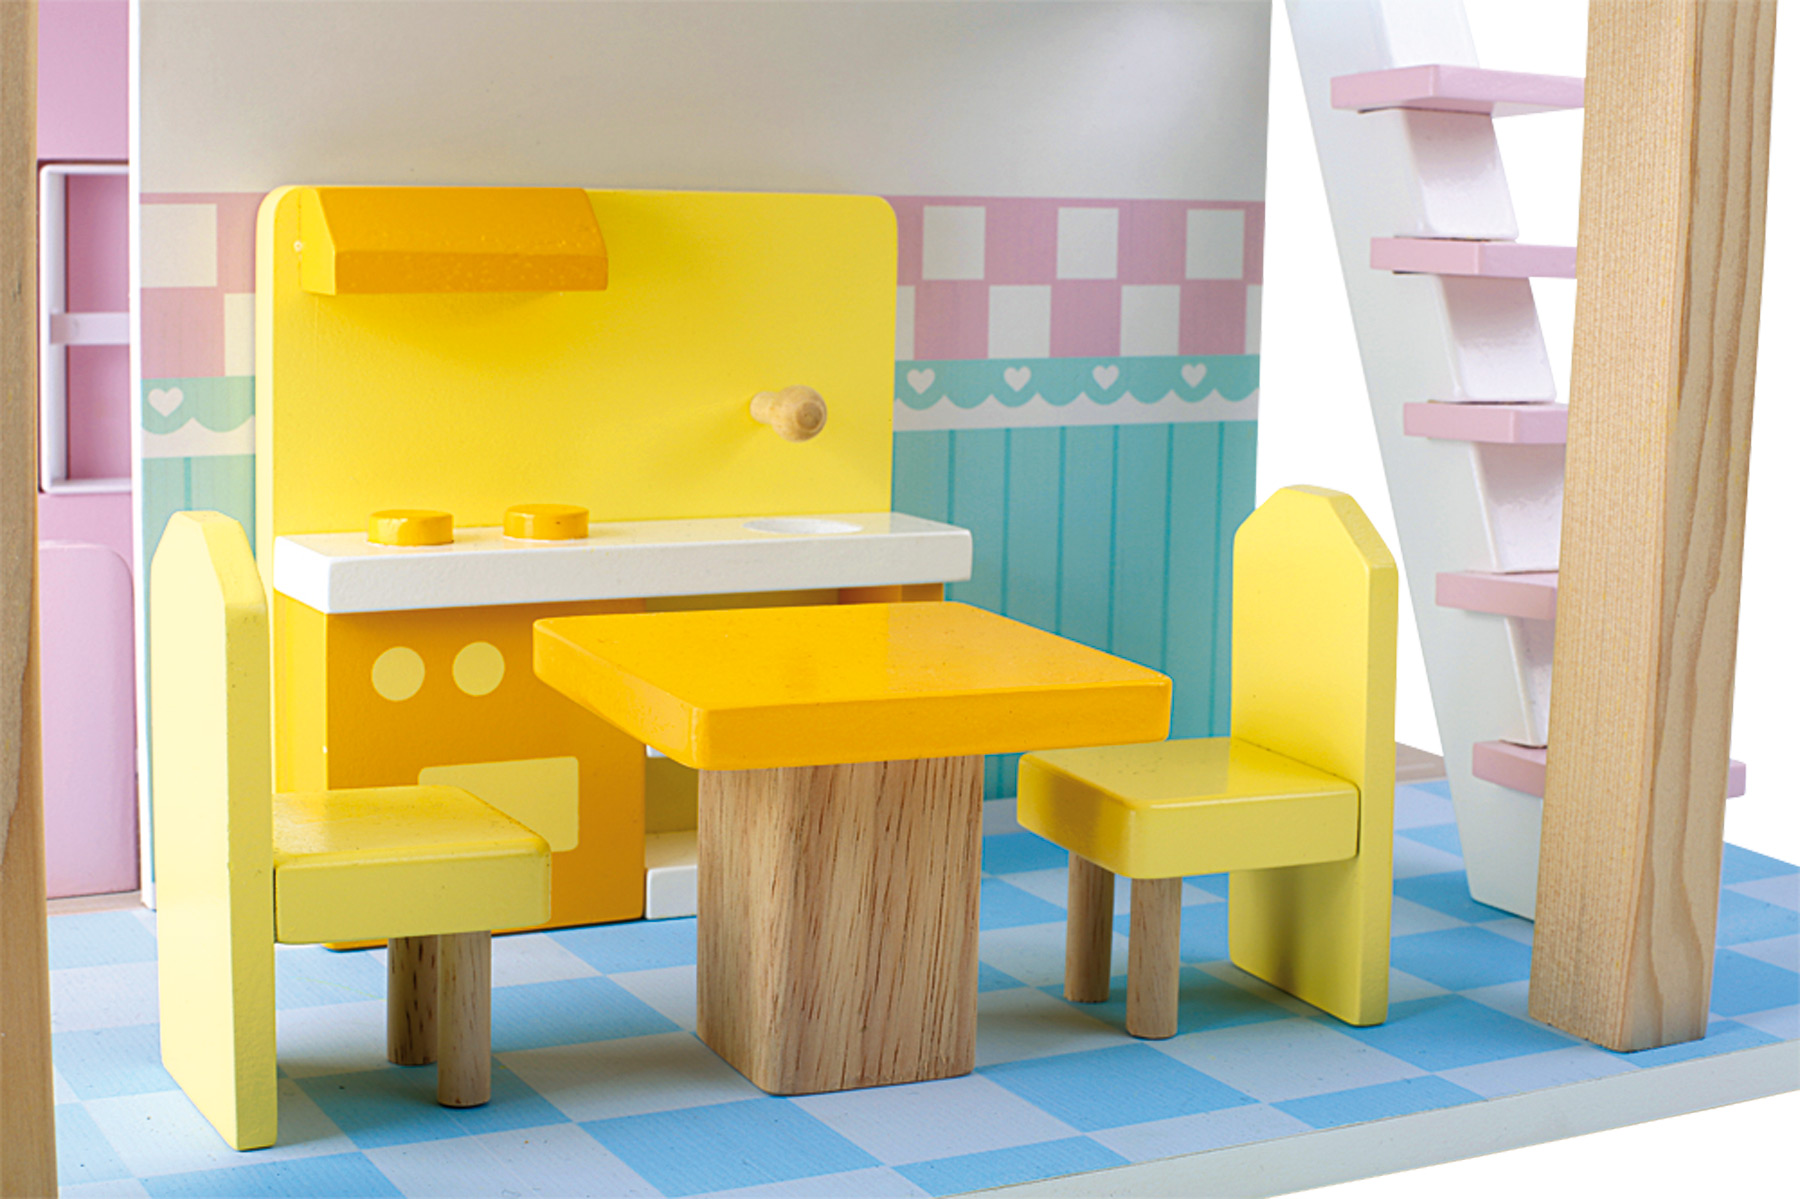 puppenhaus 2 etagen drehbar 15 m belst cke holz ab 3 jahre ca 42 x 39 x 50cm neu 4020972031105. Black Bedroom Furniture Sets. Home Design Ideas